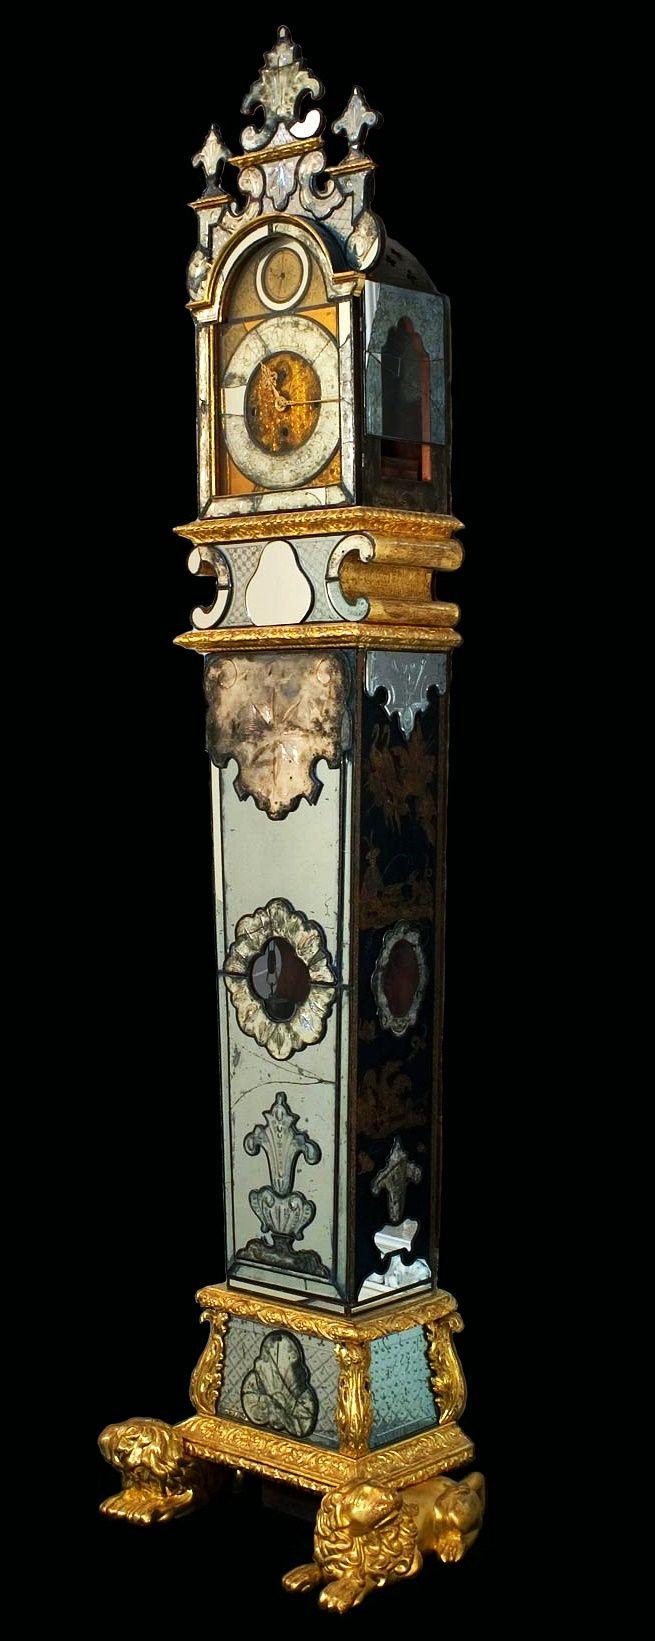 Mirror standing clock by Christoph Benjamin König in Wrocław, before 1730, Muzeum Pałacu Króla Jana III w Wilanowie, one of a pair of clocks made for Anna Orzelska's Blue Palace in Warsaw